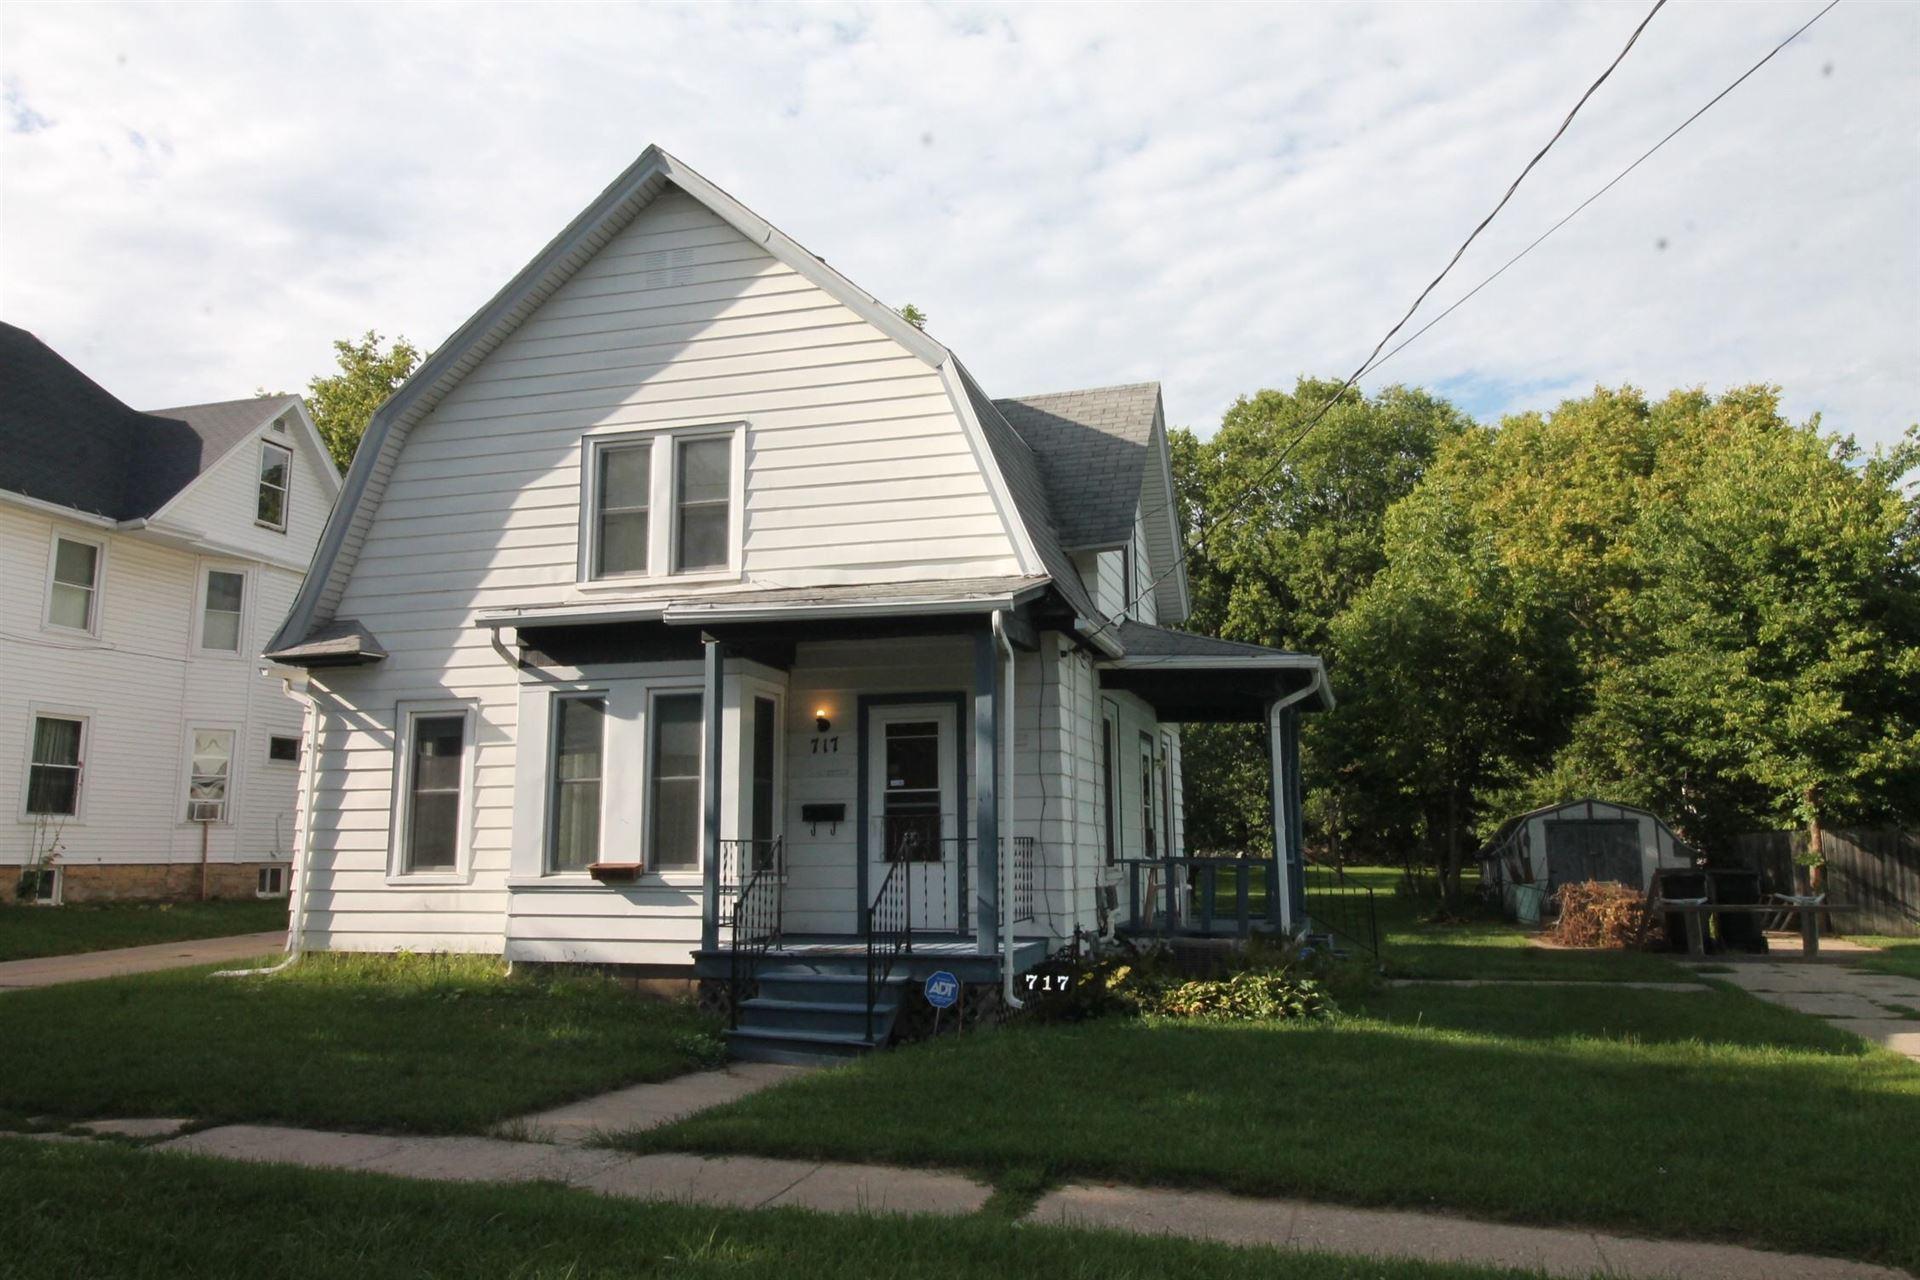 717 Euclid Ave, Beloit, WI 53511 - #: 1918455